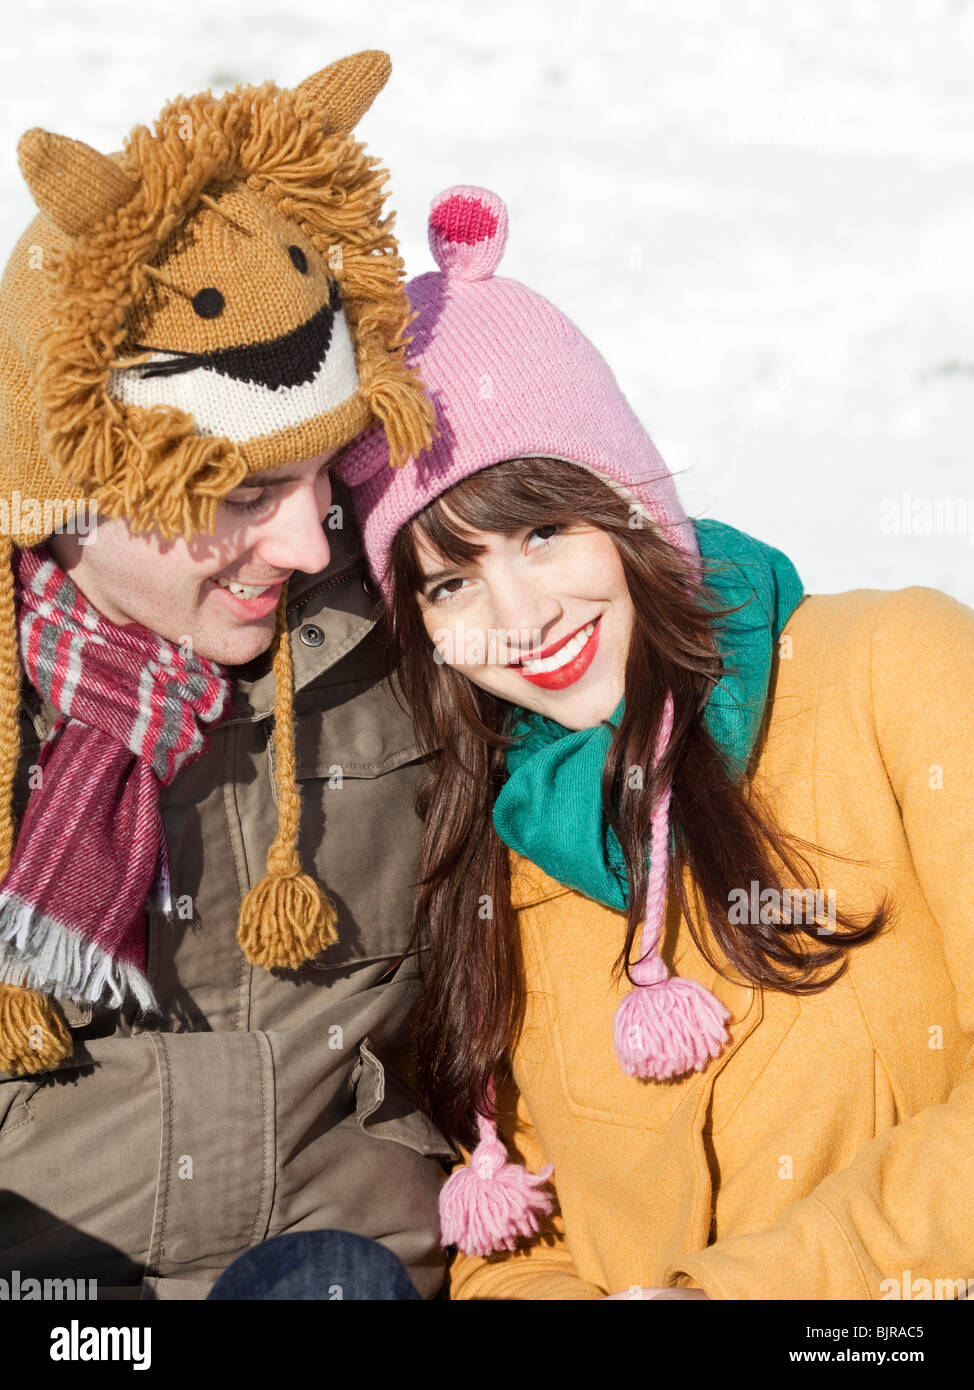 Orem, Utah, USA, boyfriend and girlfriend wearing funny knit hats, portrait - Stock Image